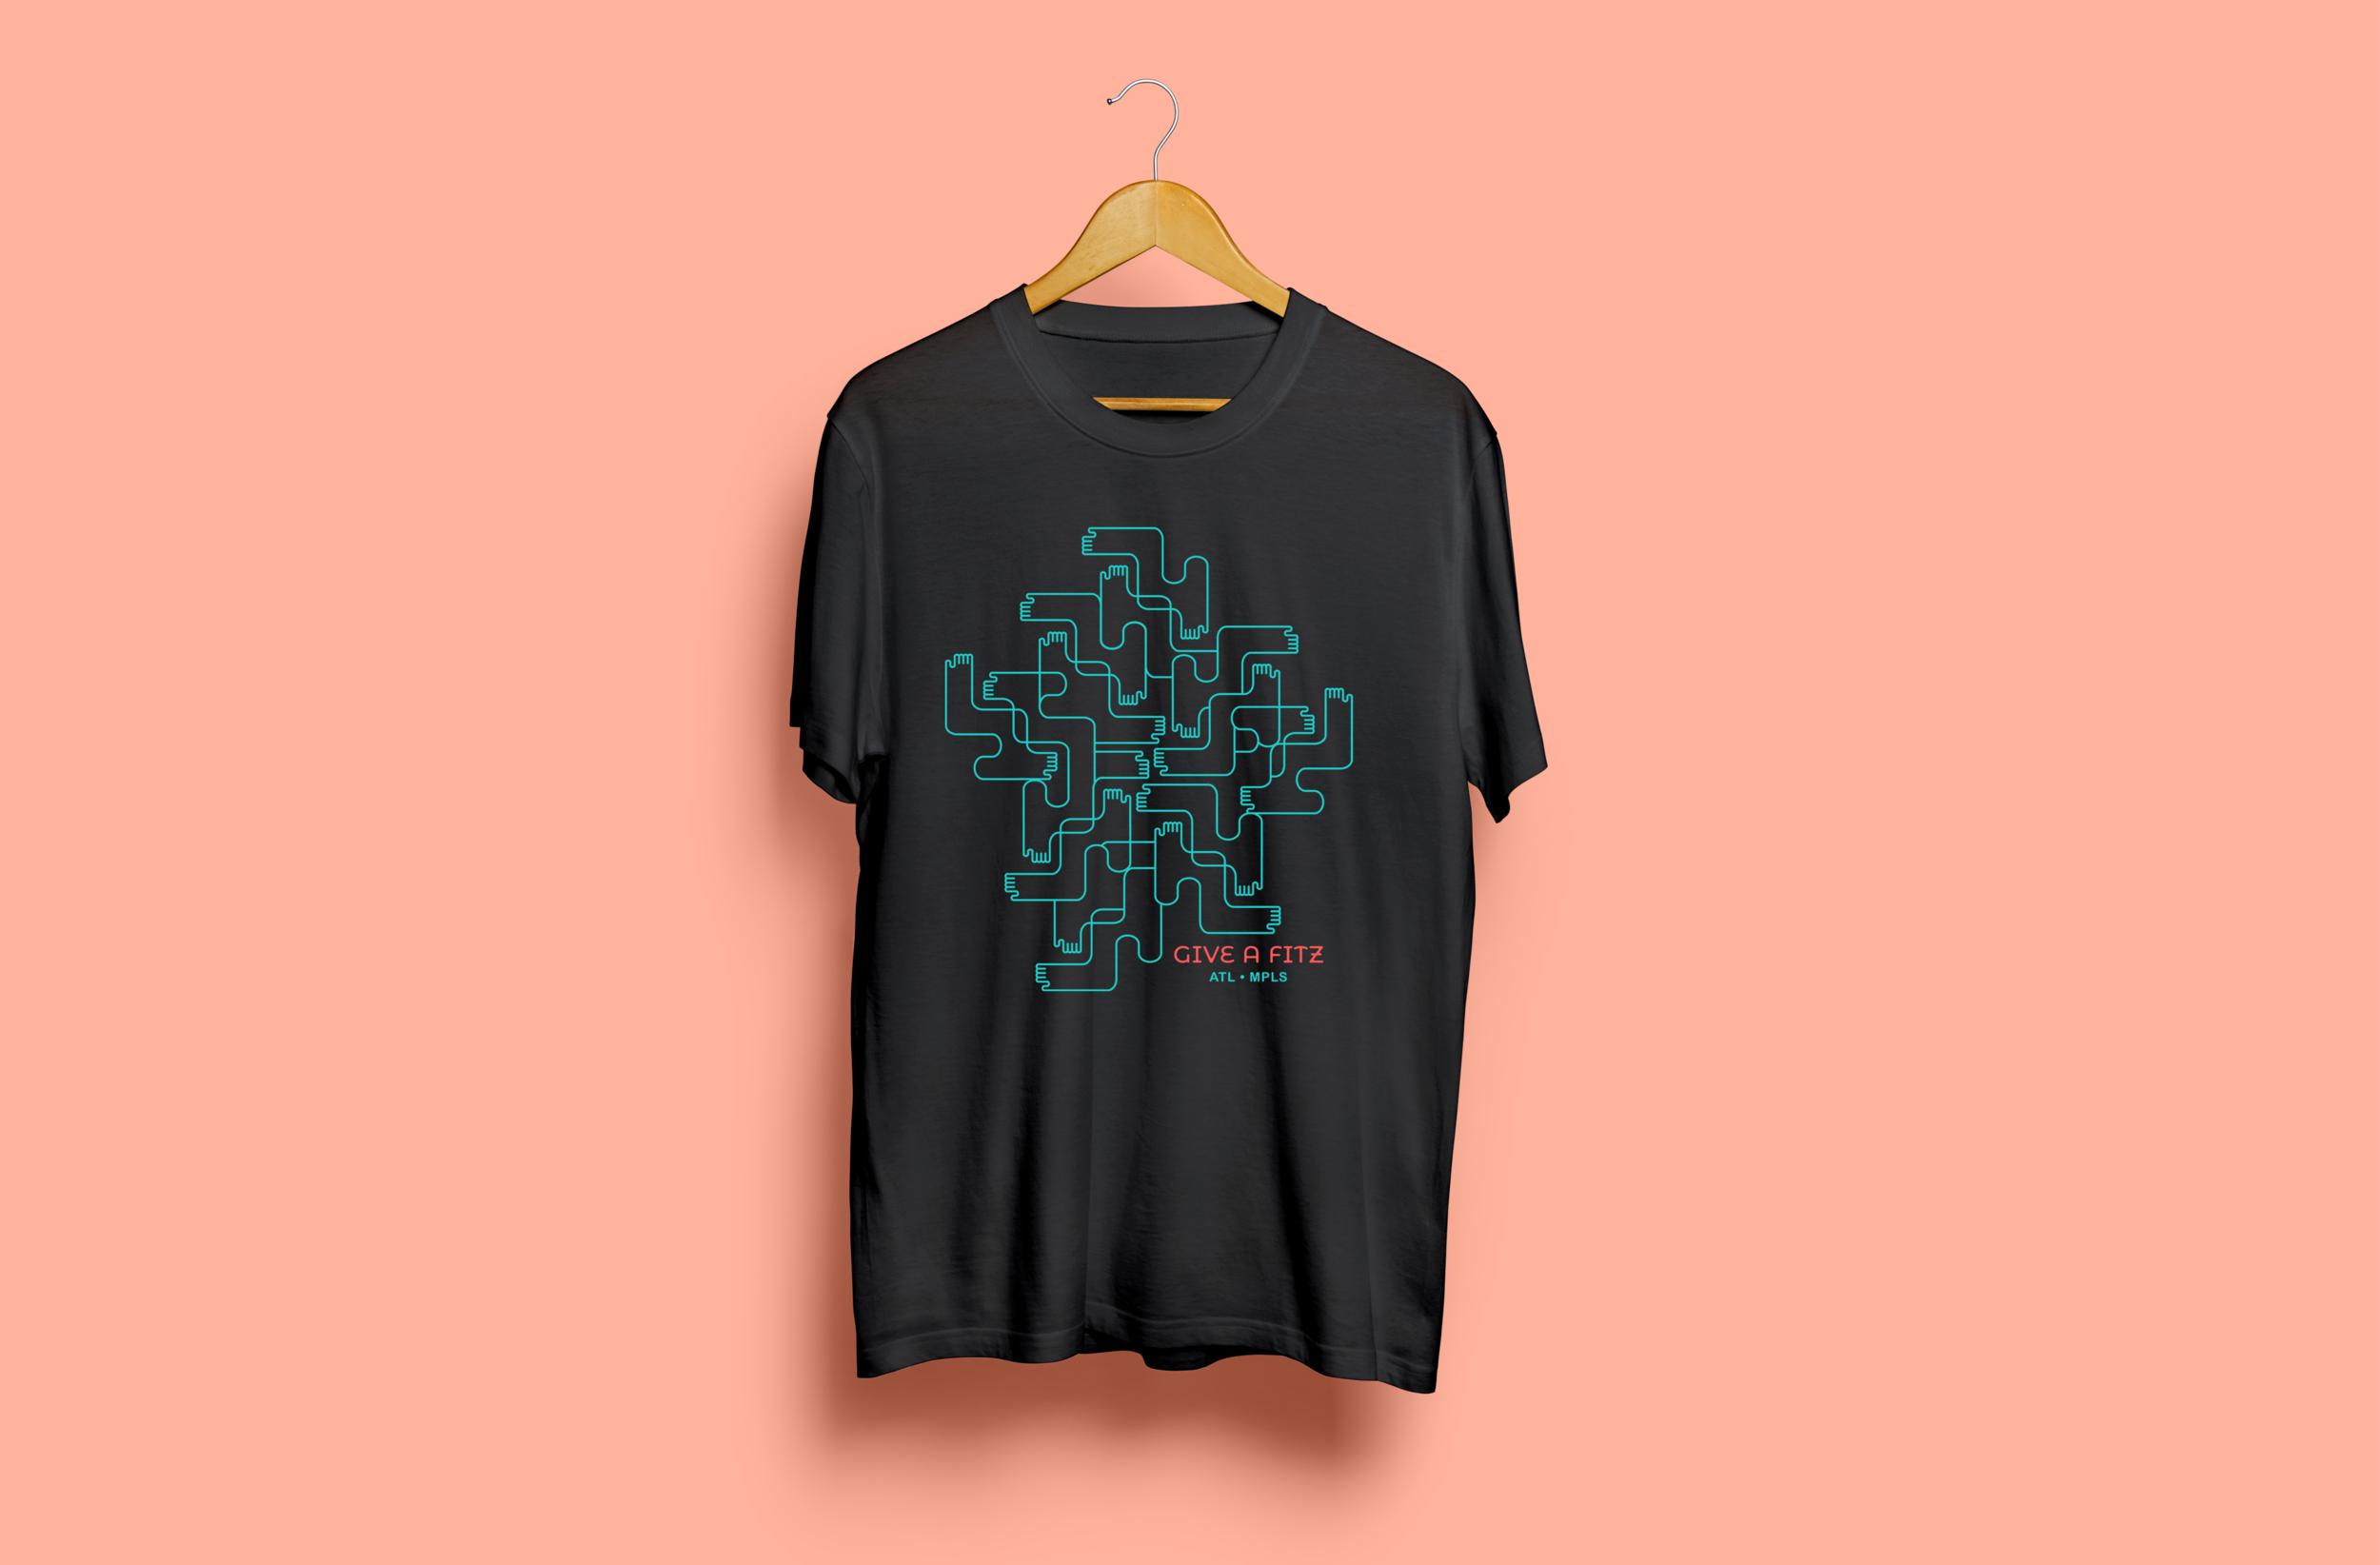 T-shirt design for Fitzco's community service initiative